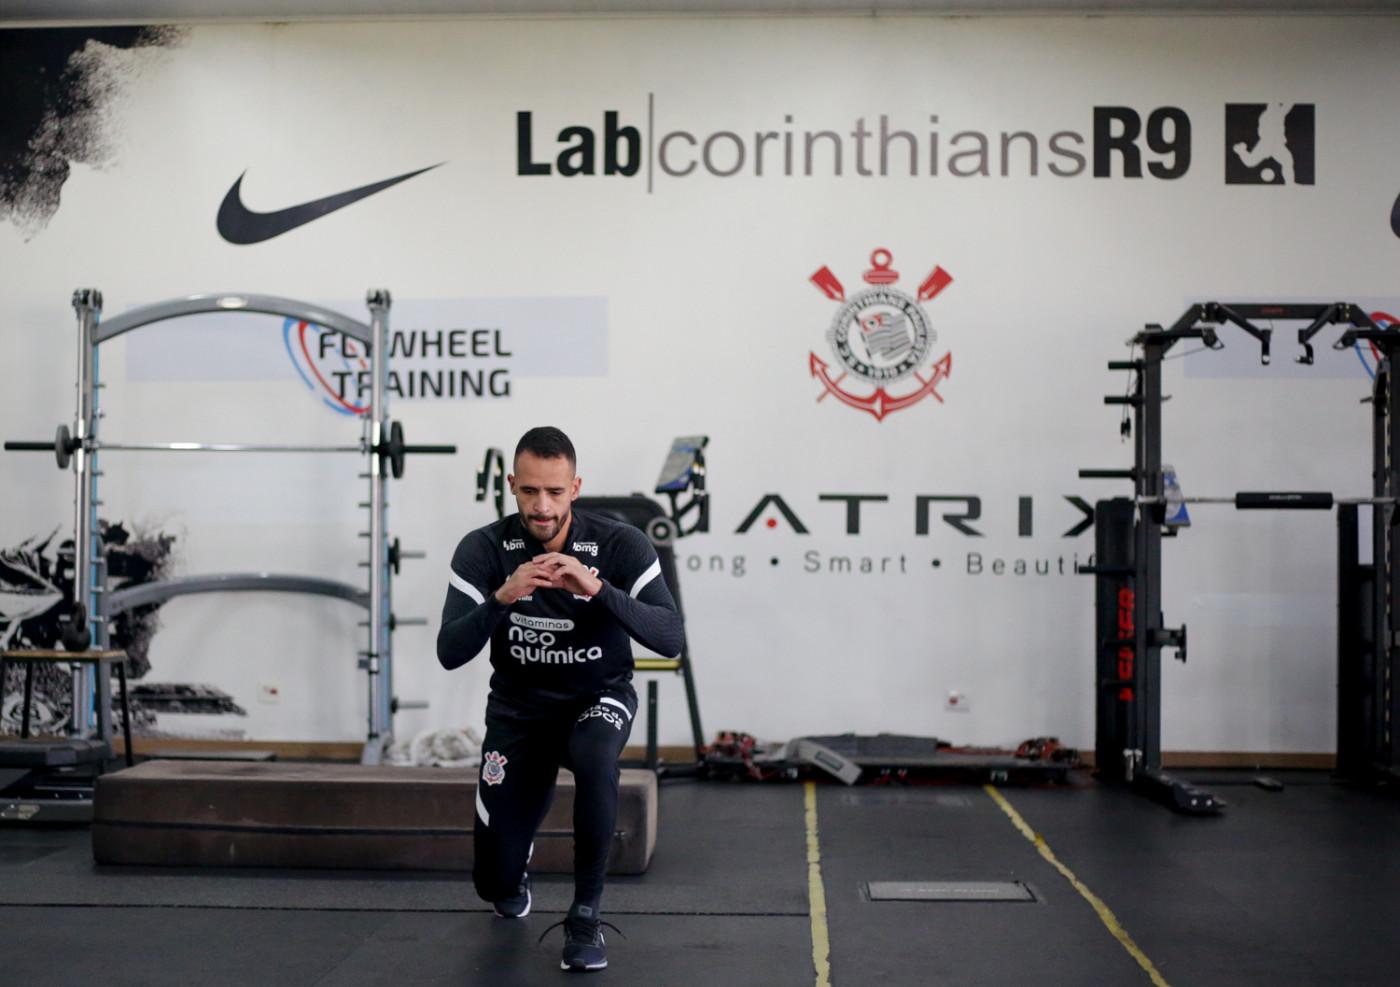 Renato Augusto treina no Corinthians